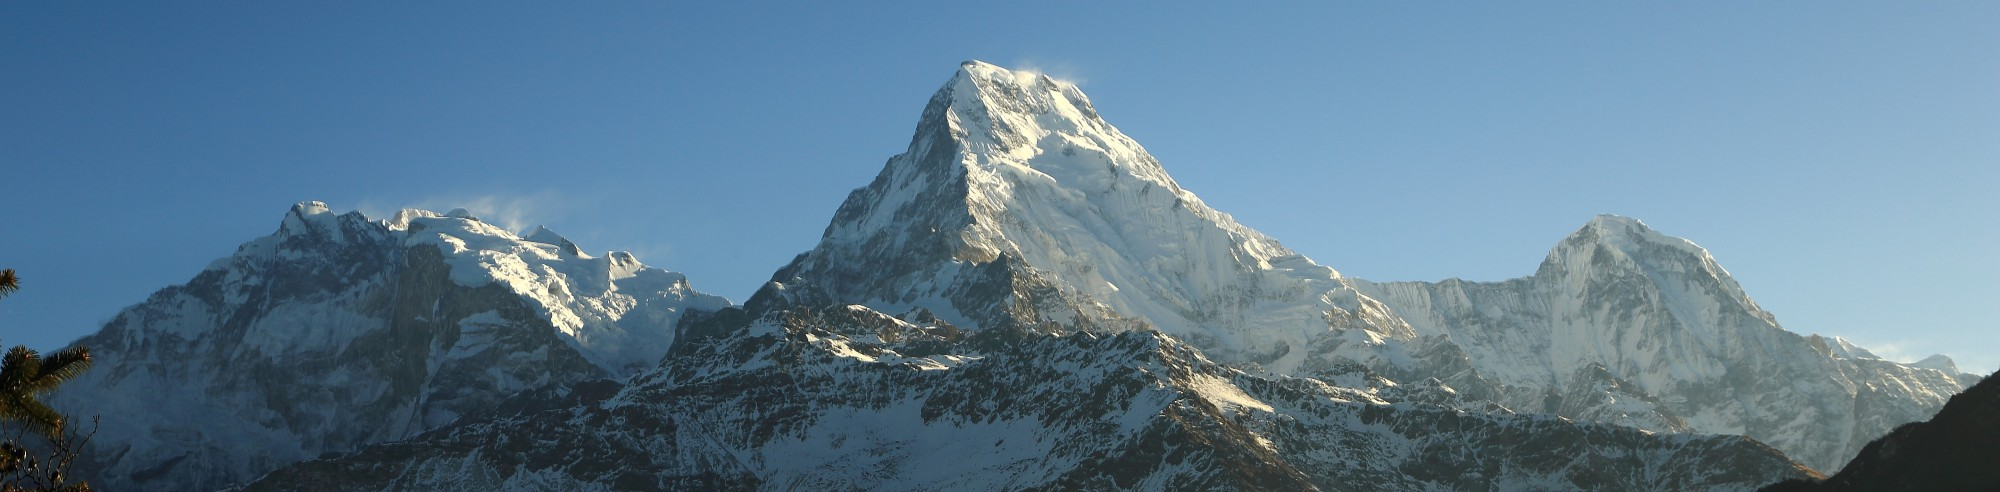 nepaltravel-annapurna-base-camp